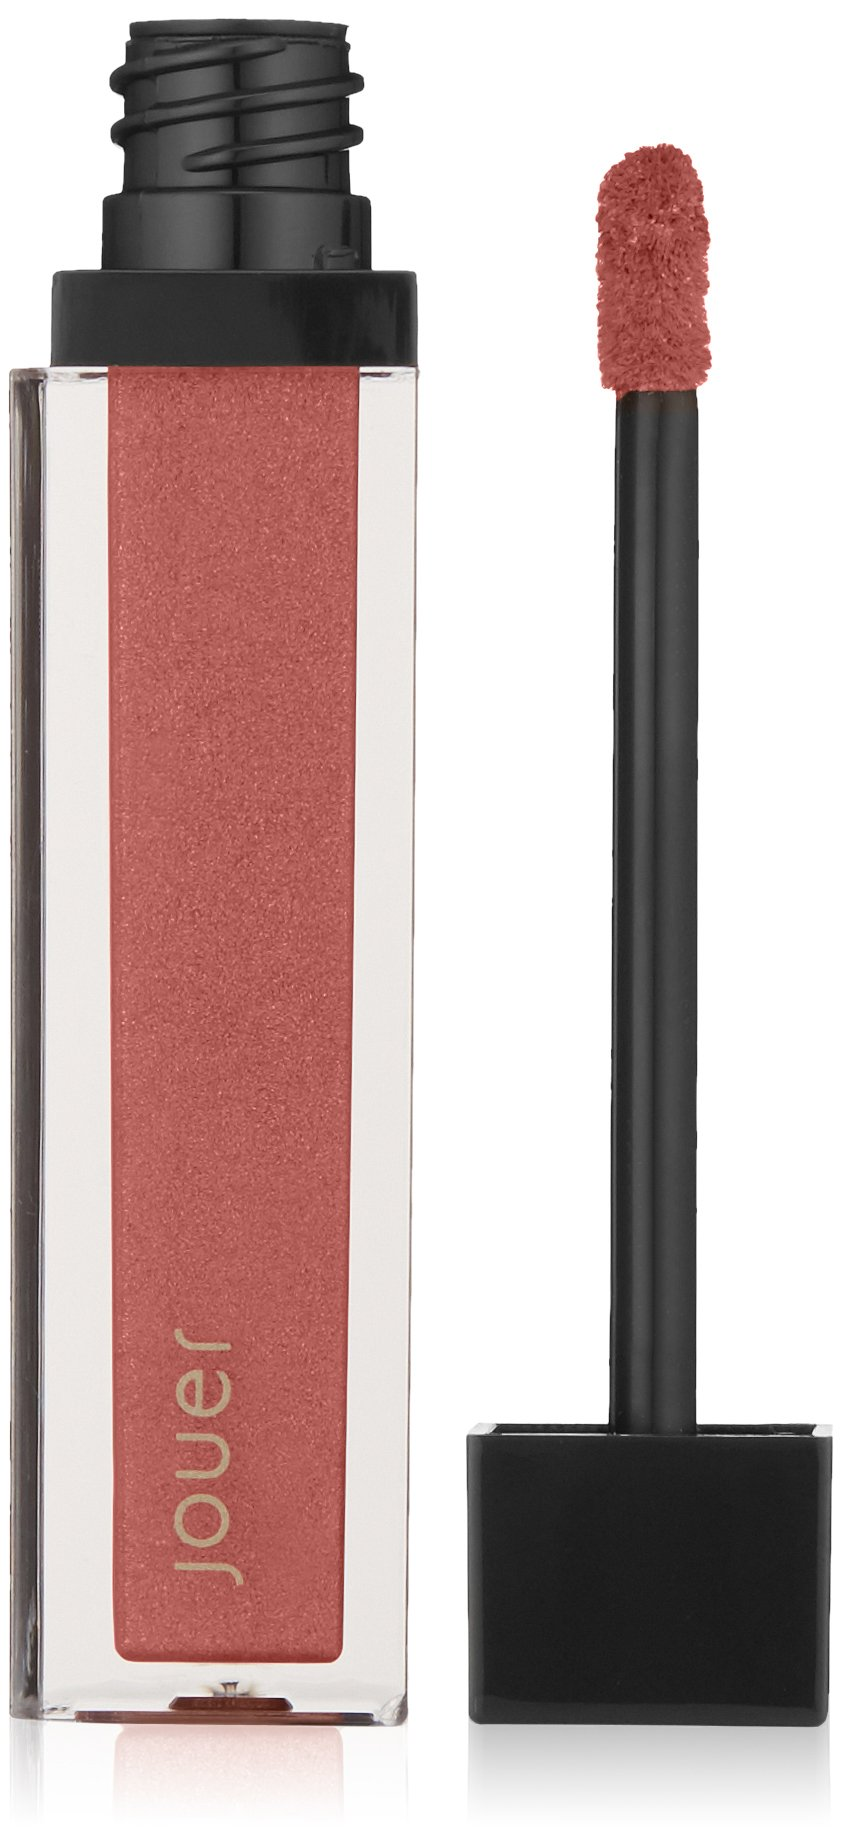 Jouer Long-wear Lip Crème